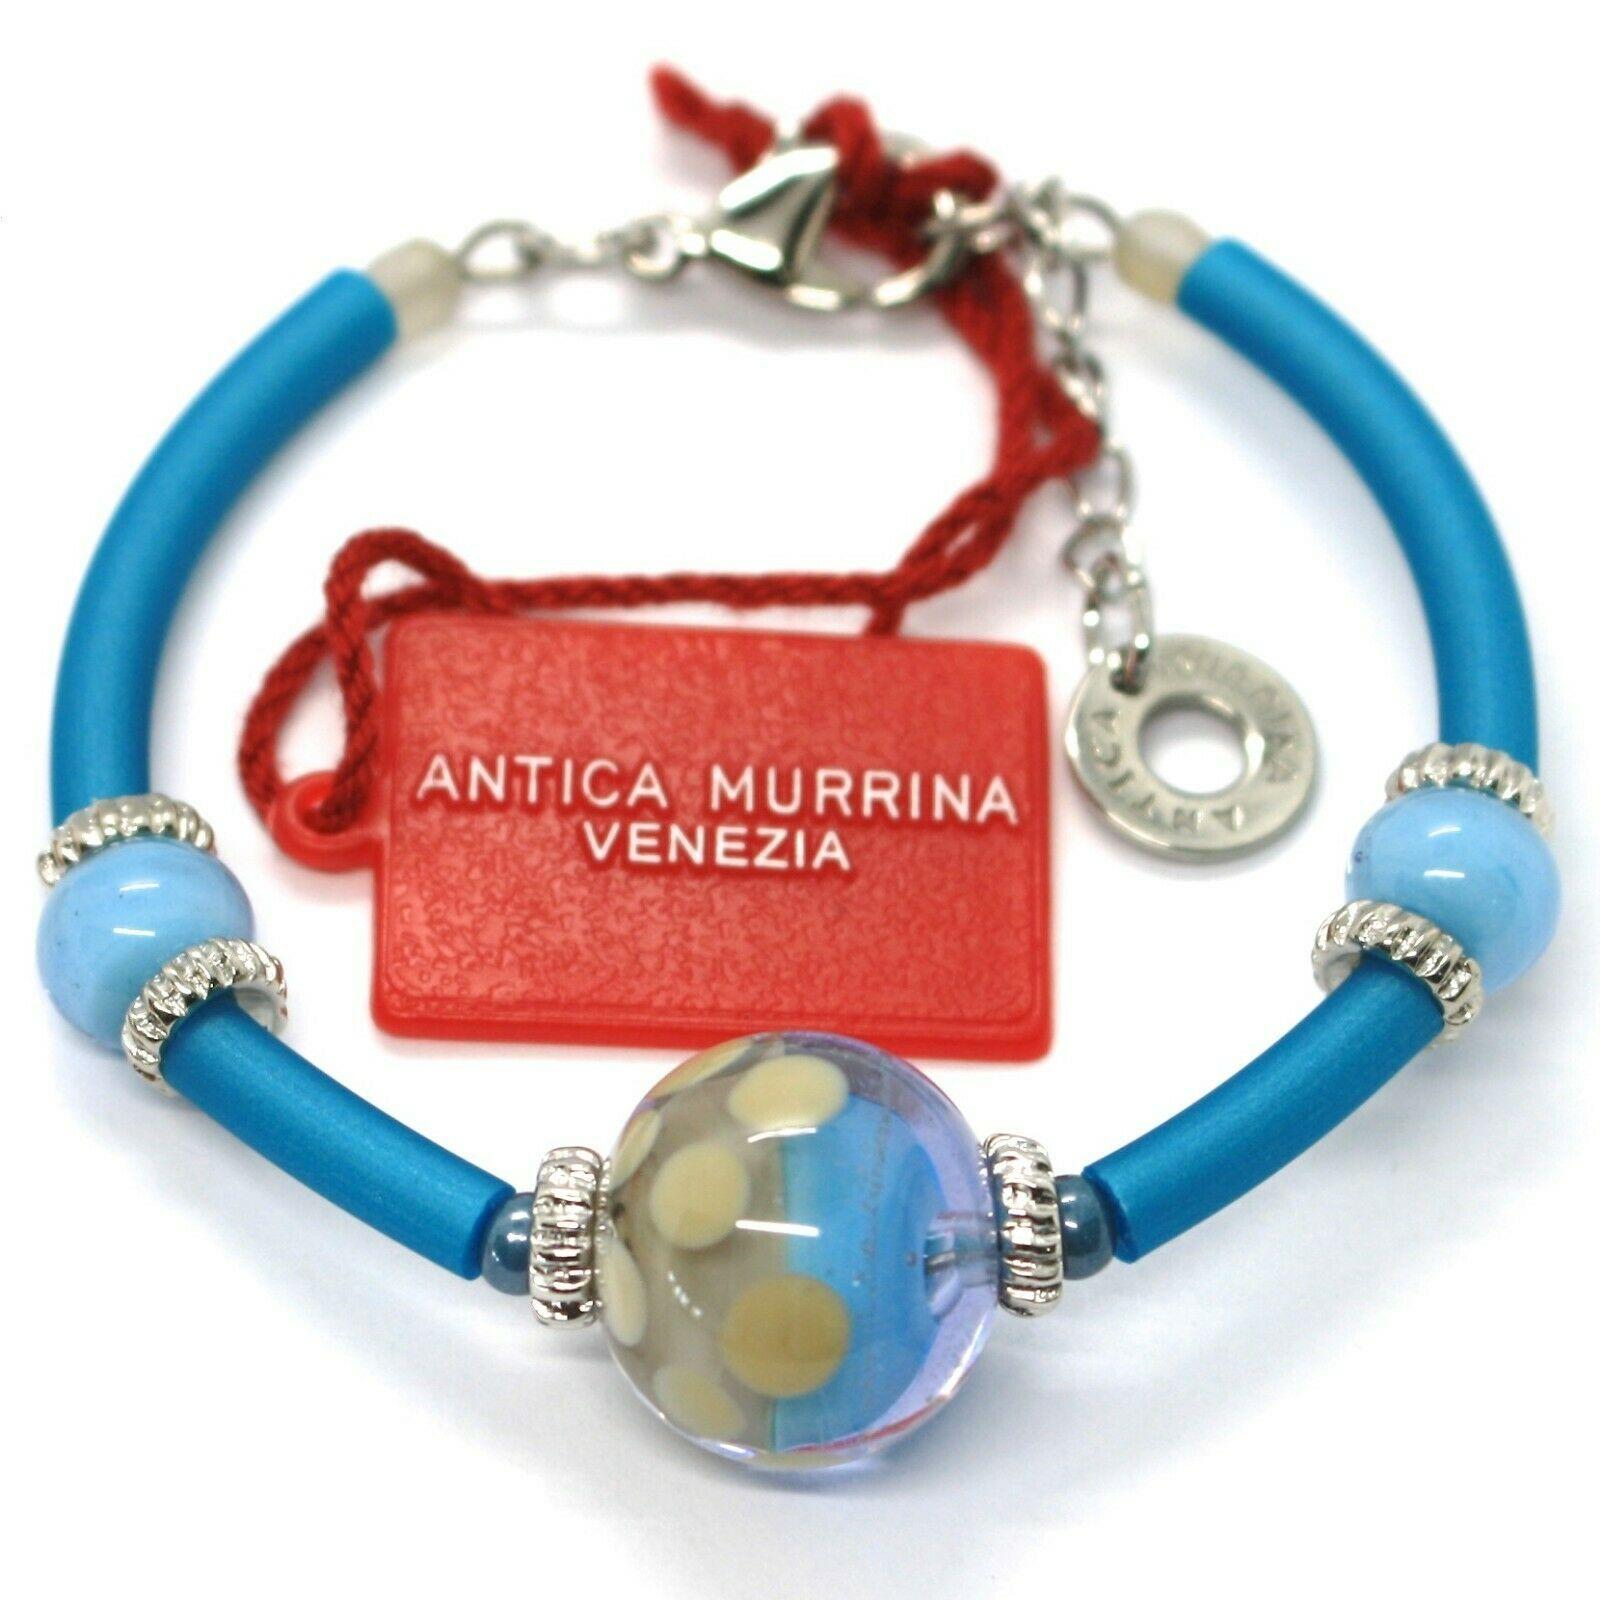 BRACELET ANTICA MURRINA VENEZIA,BR718A07,LIGHT BLUE,SPHERE POLKA DOT,SEMI-RIGID